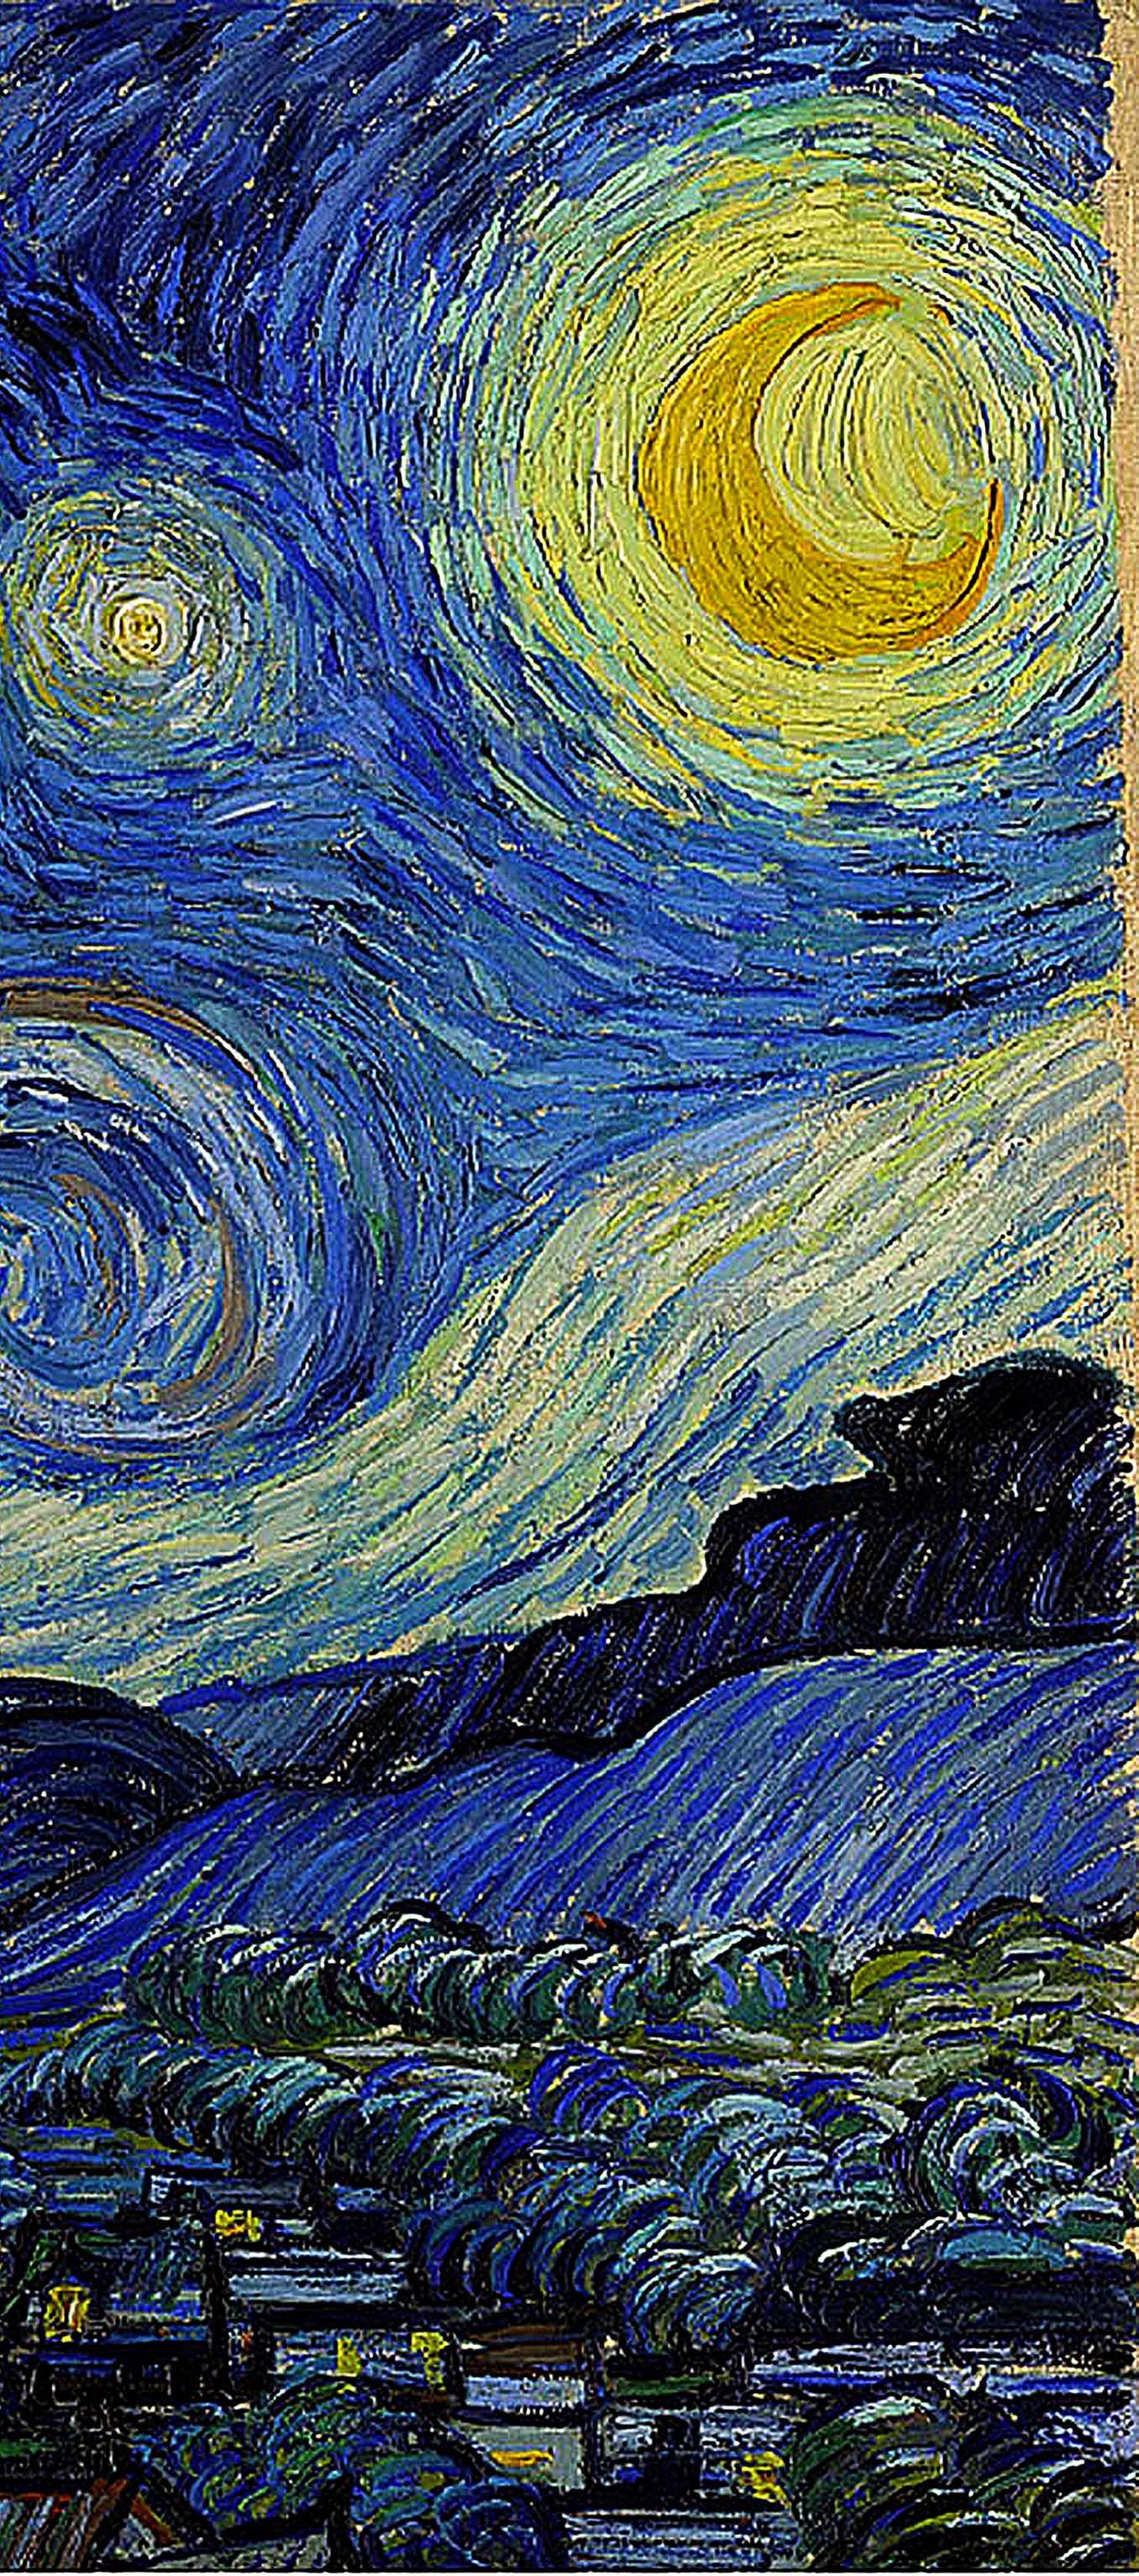 'Starry Night' detail 1889                                            Vincent van Gogh